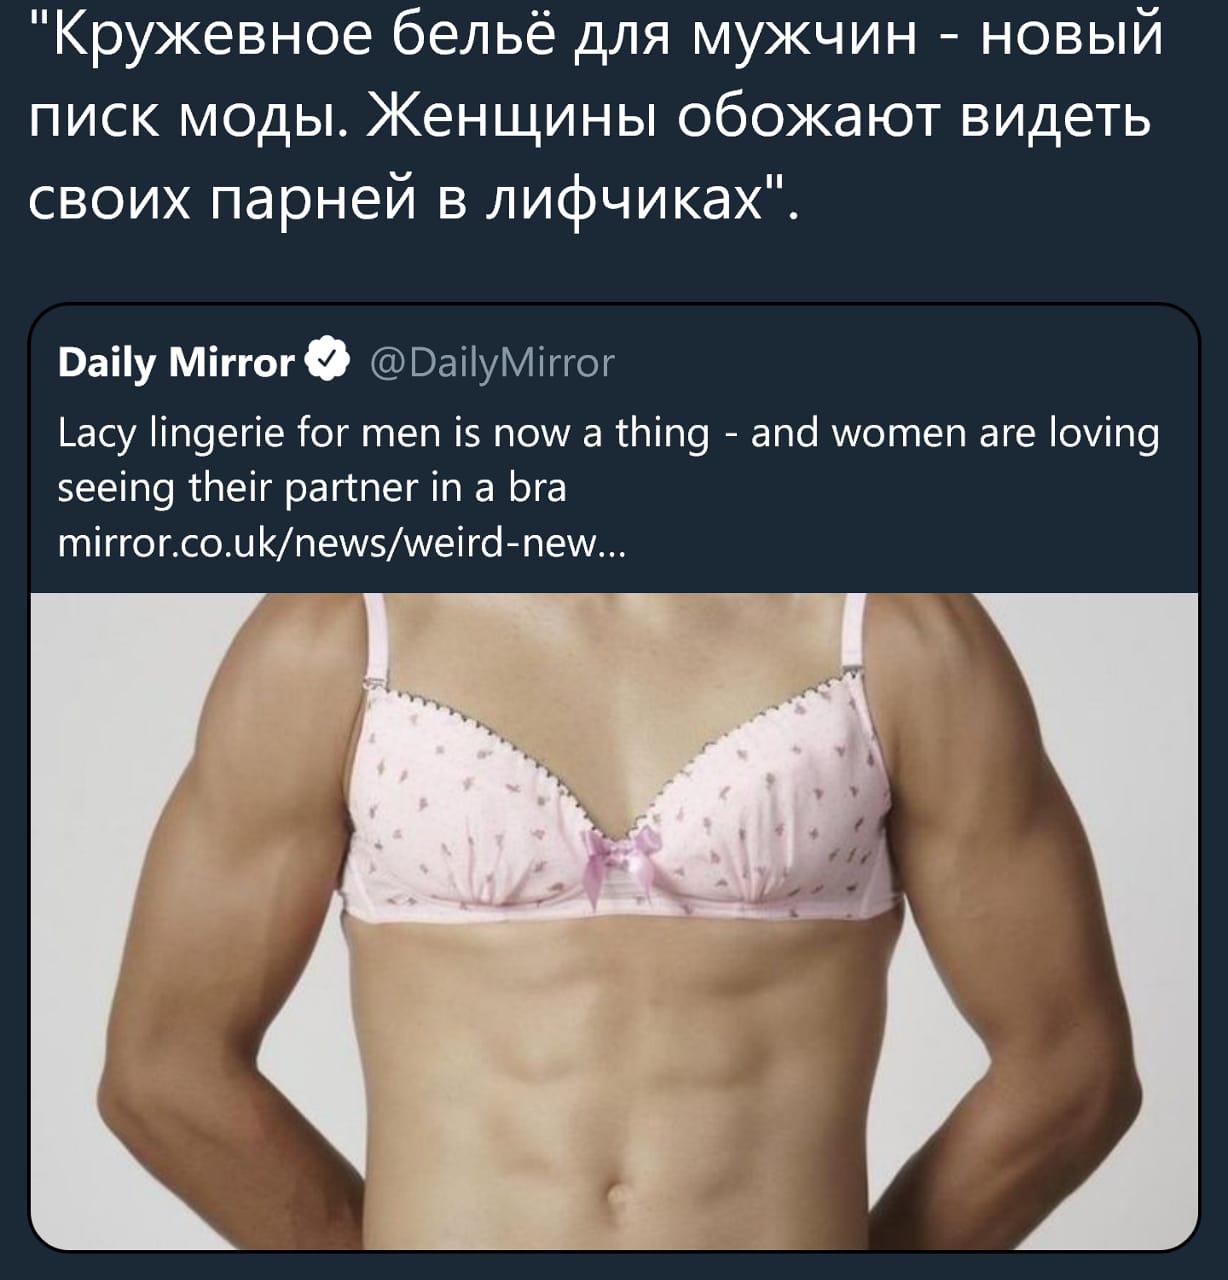 https://www.mirror.co.uk/news/weird-news/lacy-bras-men-now-thing-13137511